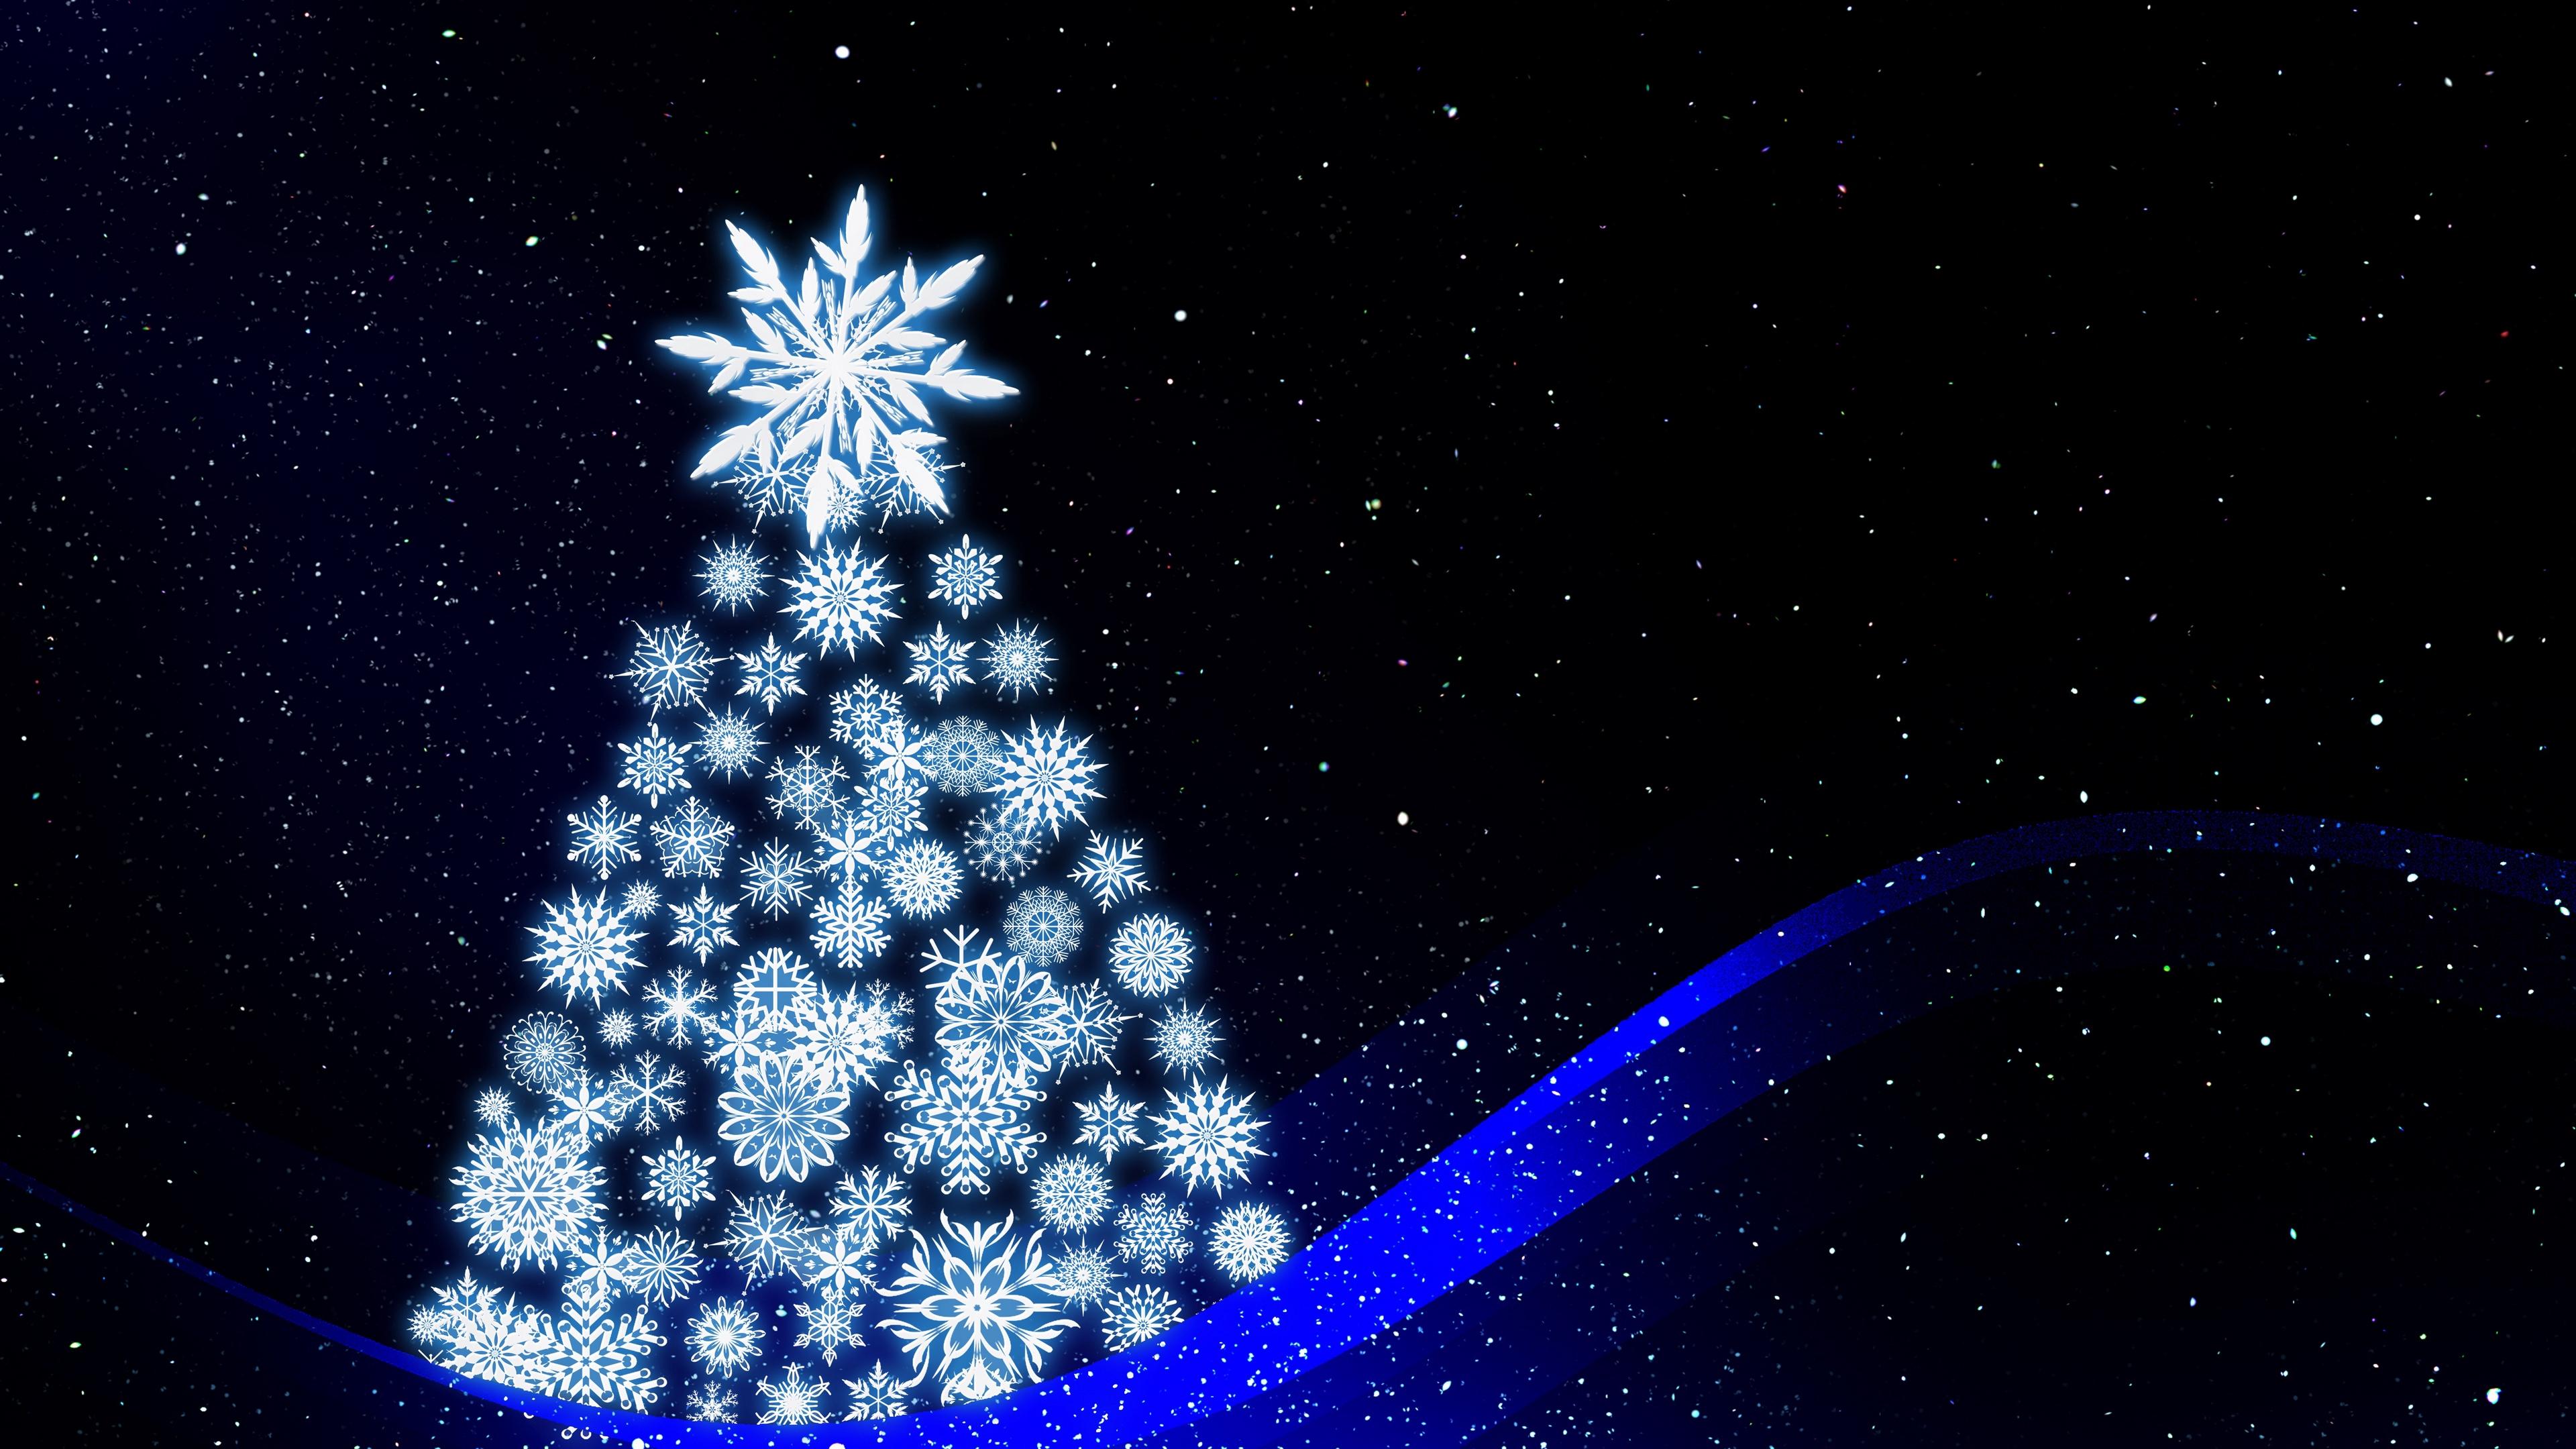 christmas tree art new year 4k 1538344726 - christmas tree, art, new year 4k - new year, christmas tree, art